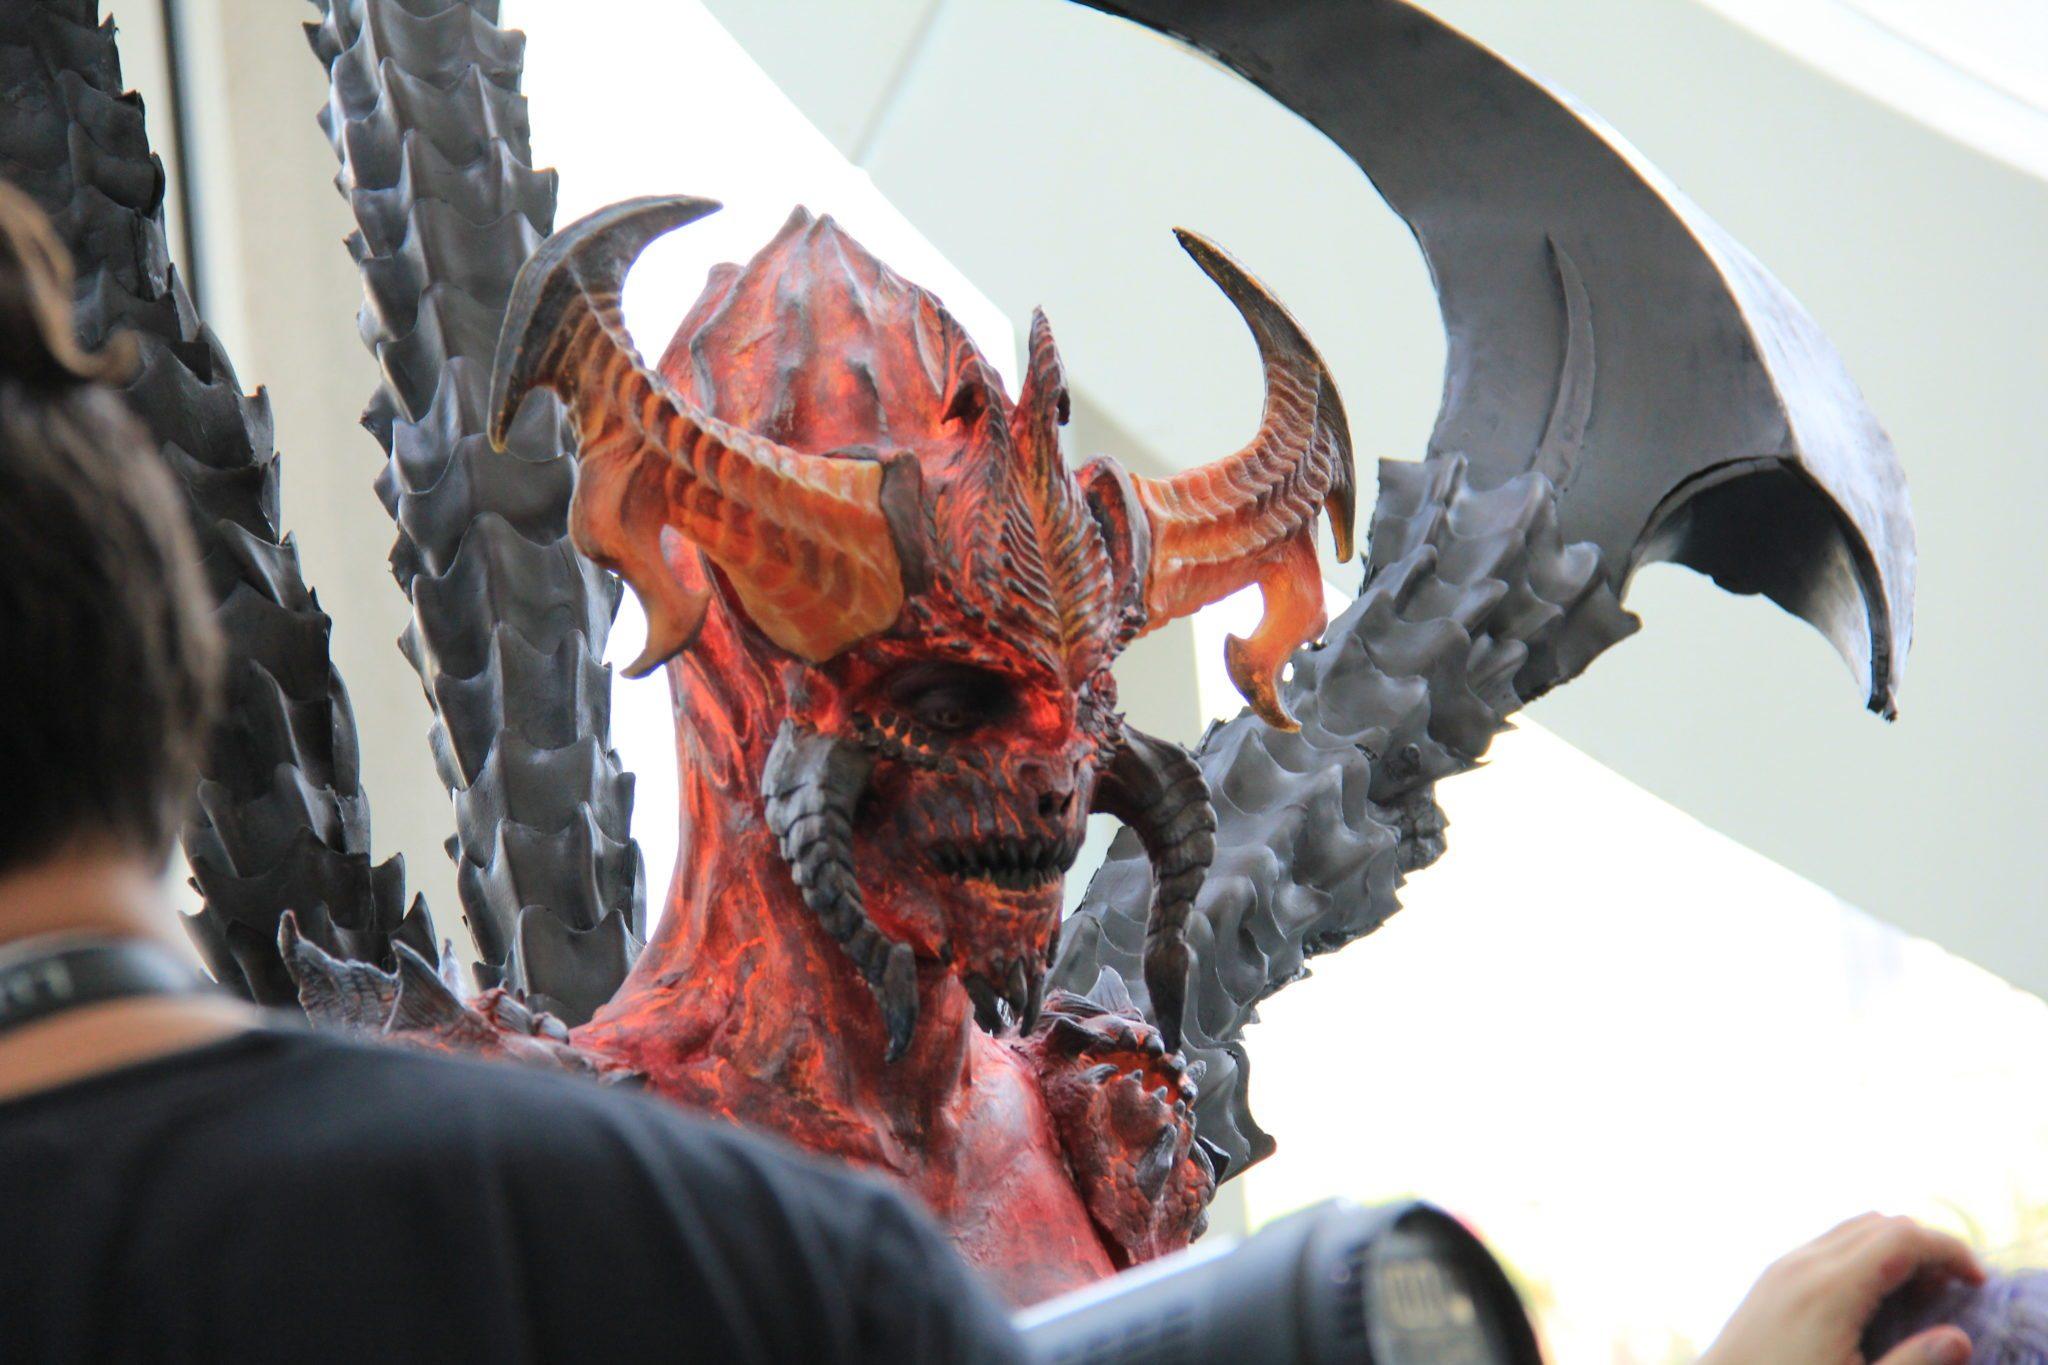 San Diego Comic Con 2015 - Cosplayers 6